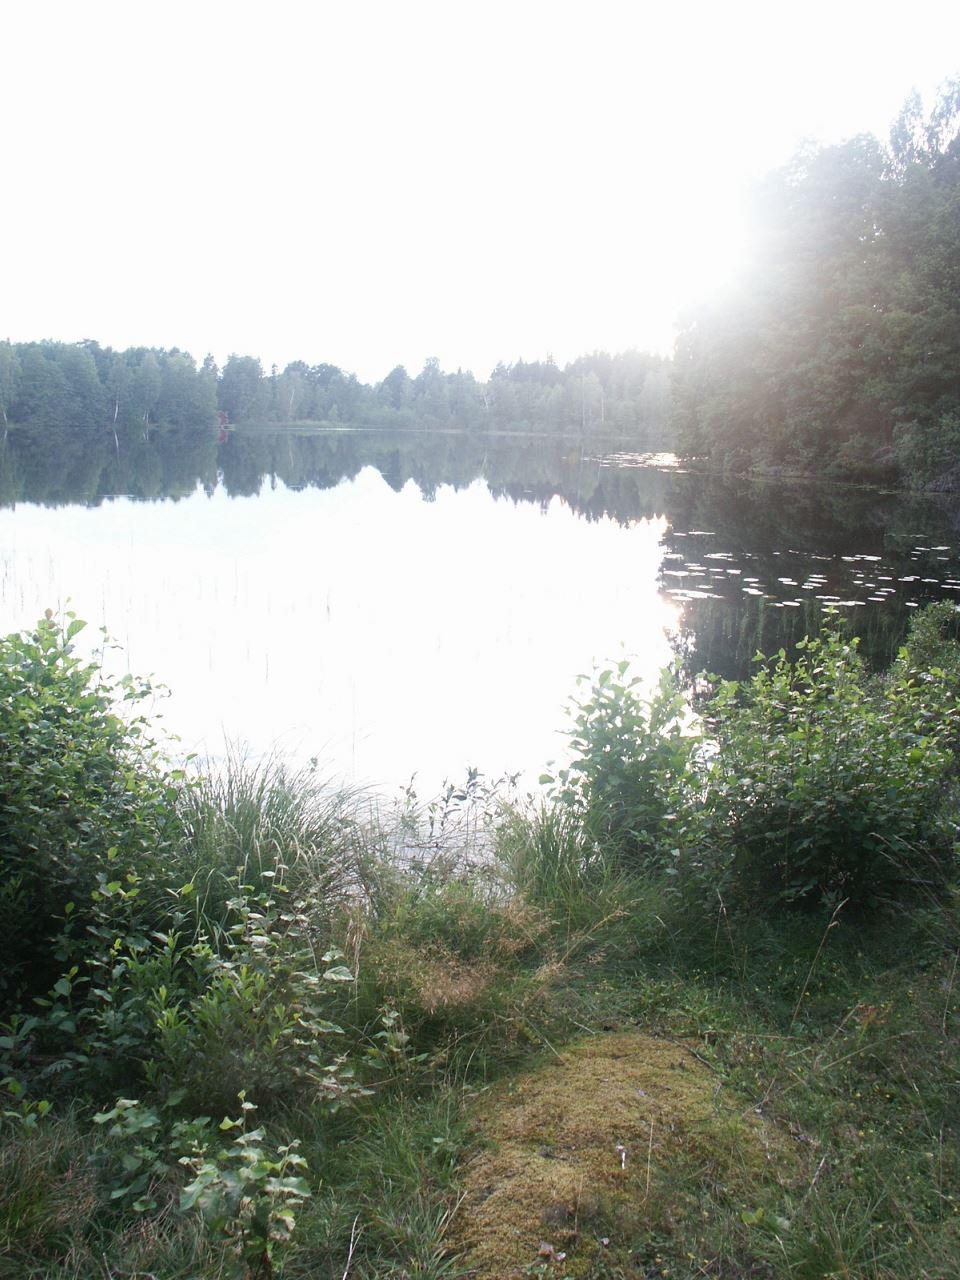 Krokshult rural area hiking trail